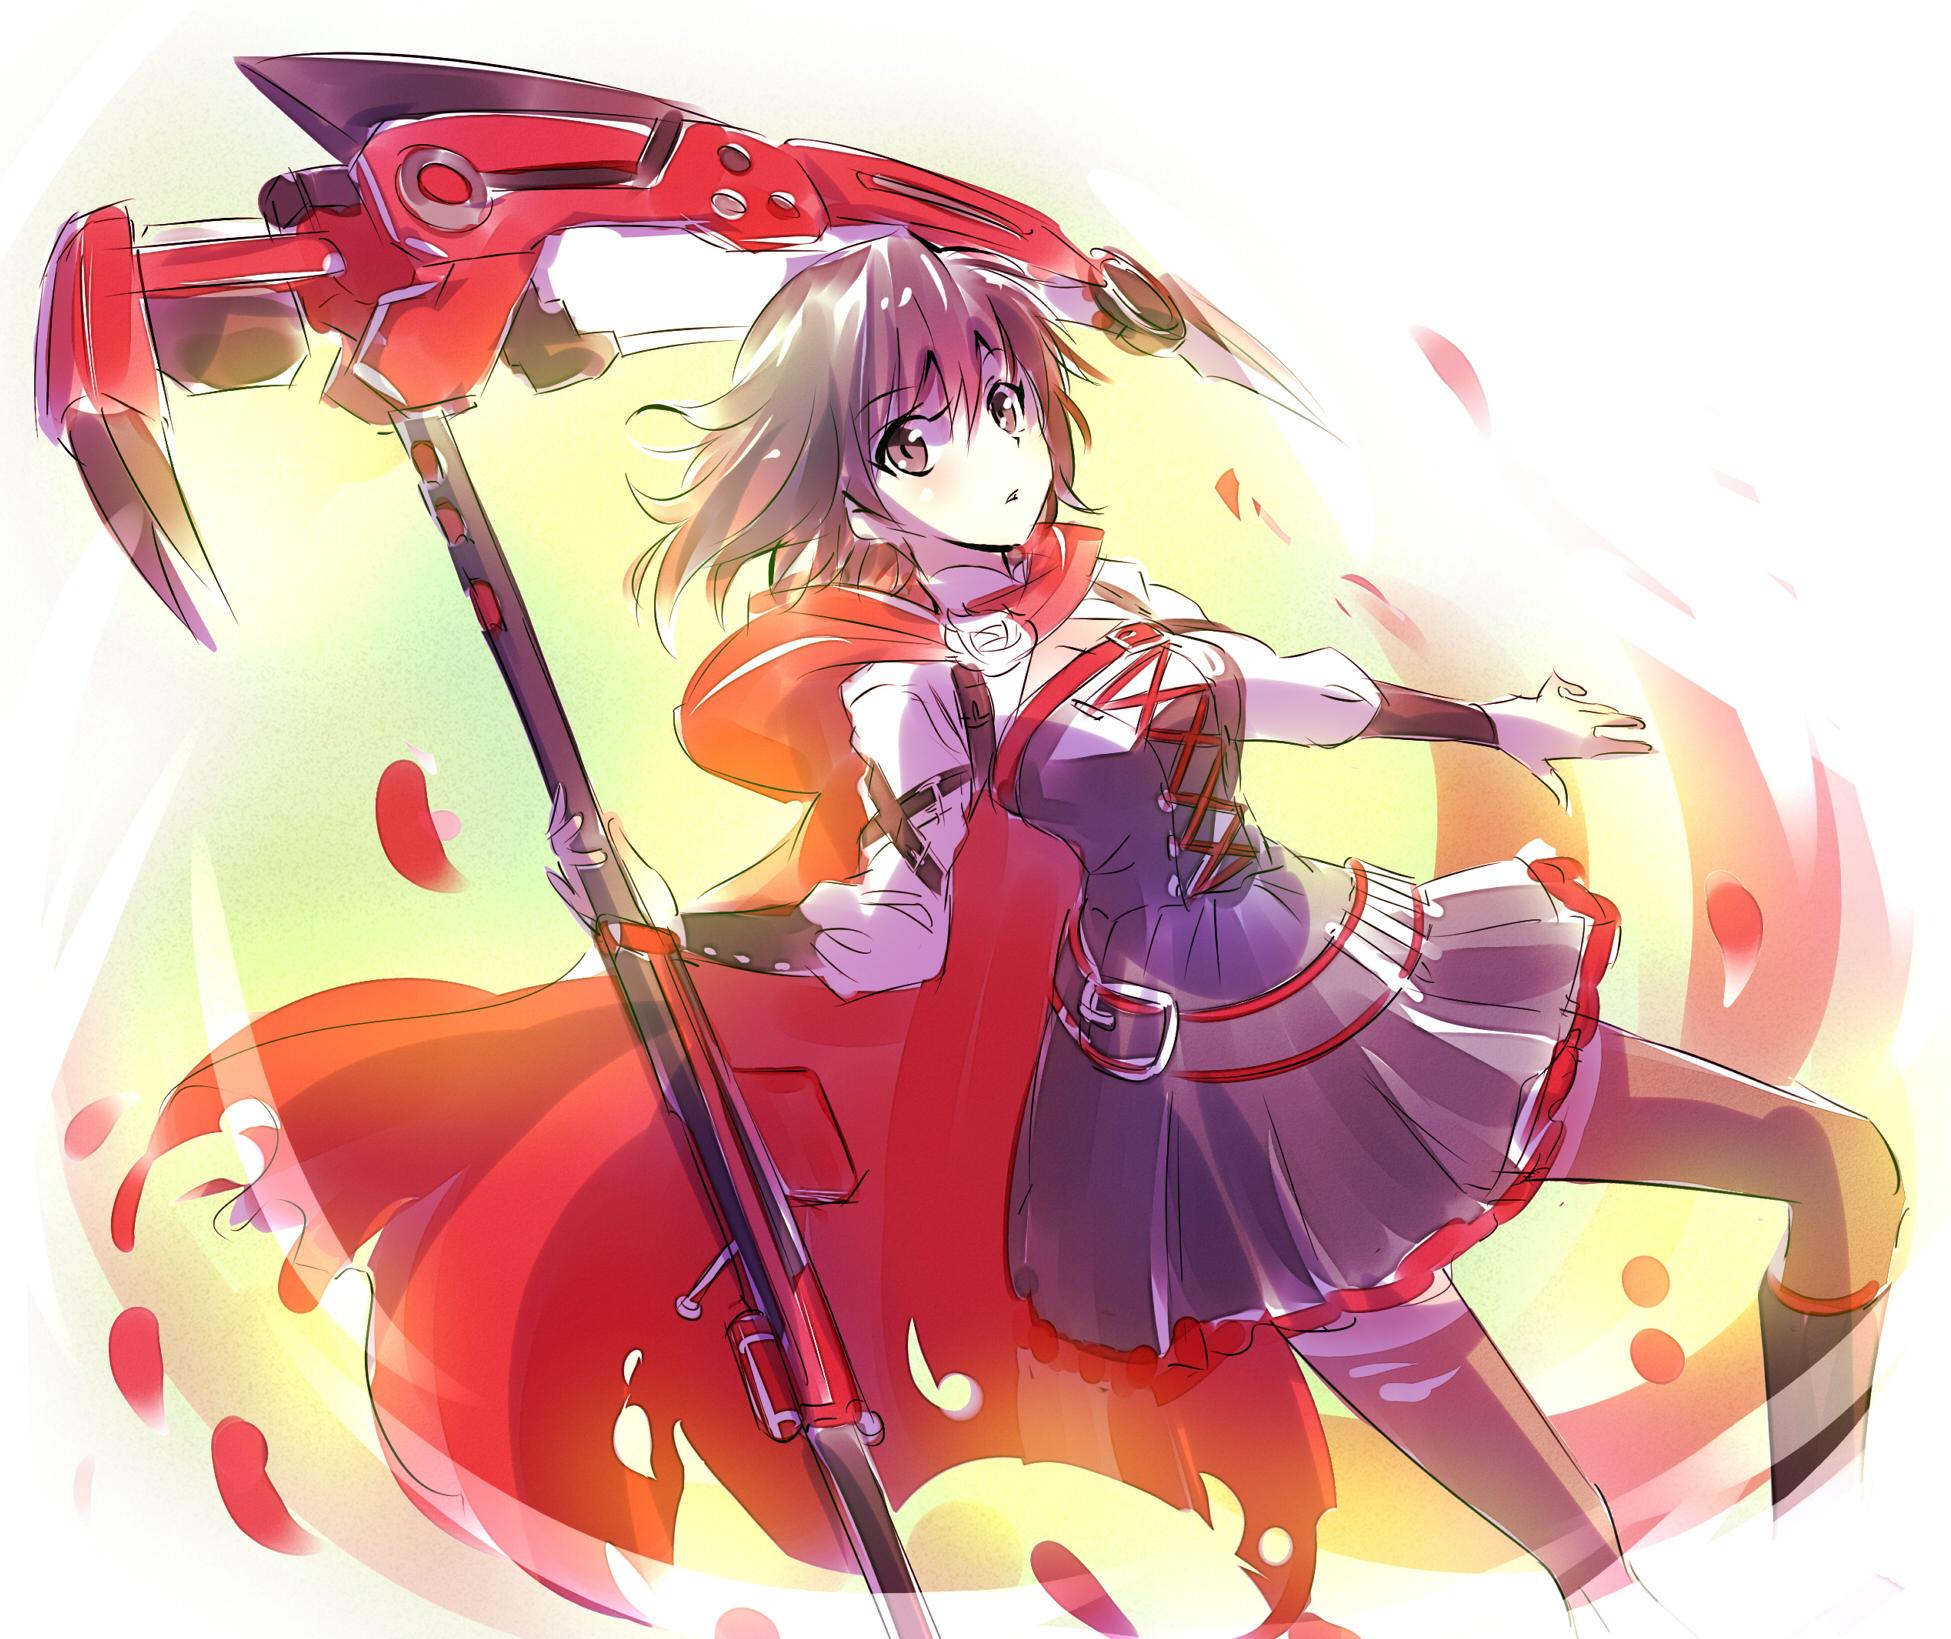 Ruby rose rwby image 2063474 zerochan anime image board - Rwby ruby rose fanart ...